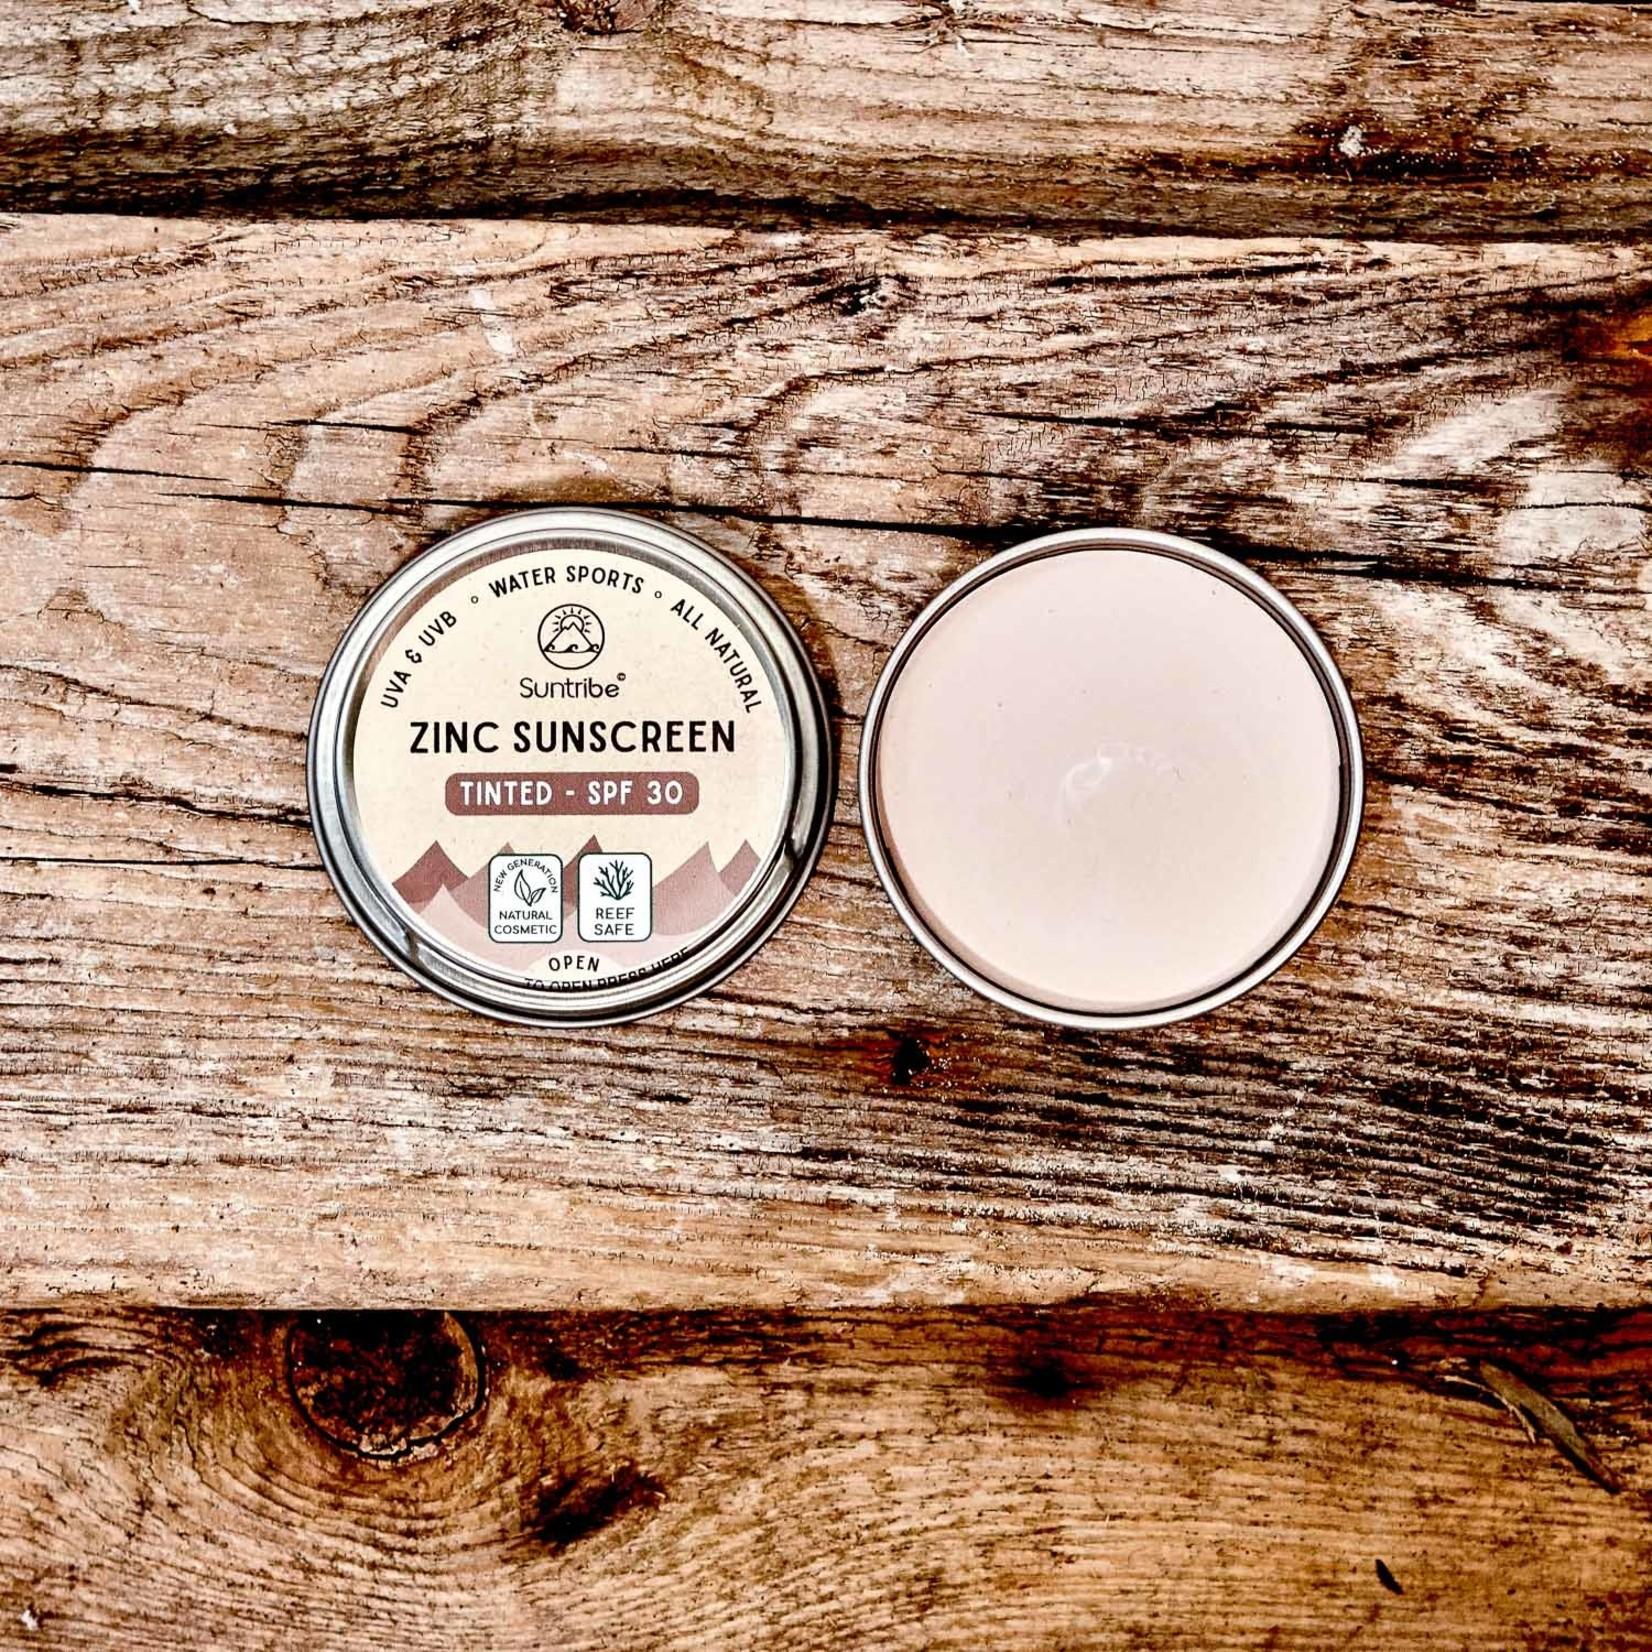 Suntribe Suntribe Zink Zonnecrème Getint - Naturel Mud Tint - SPF30